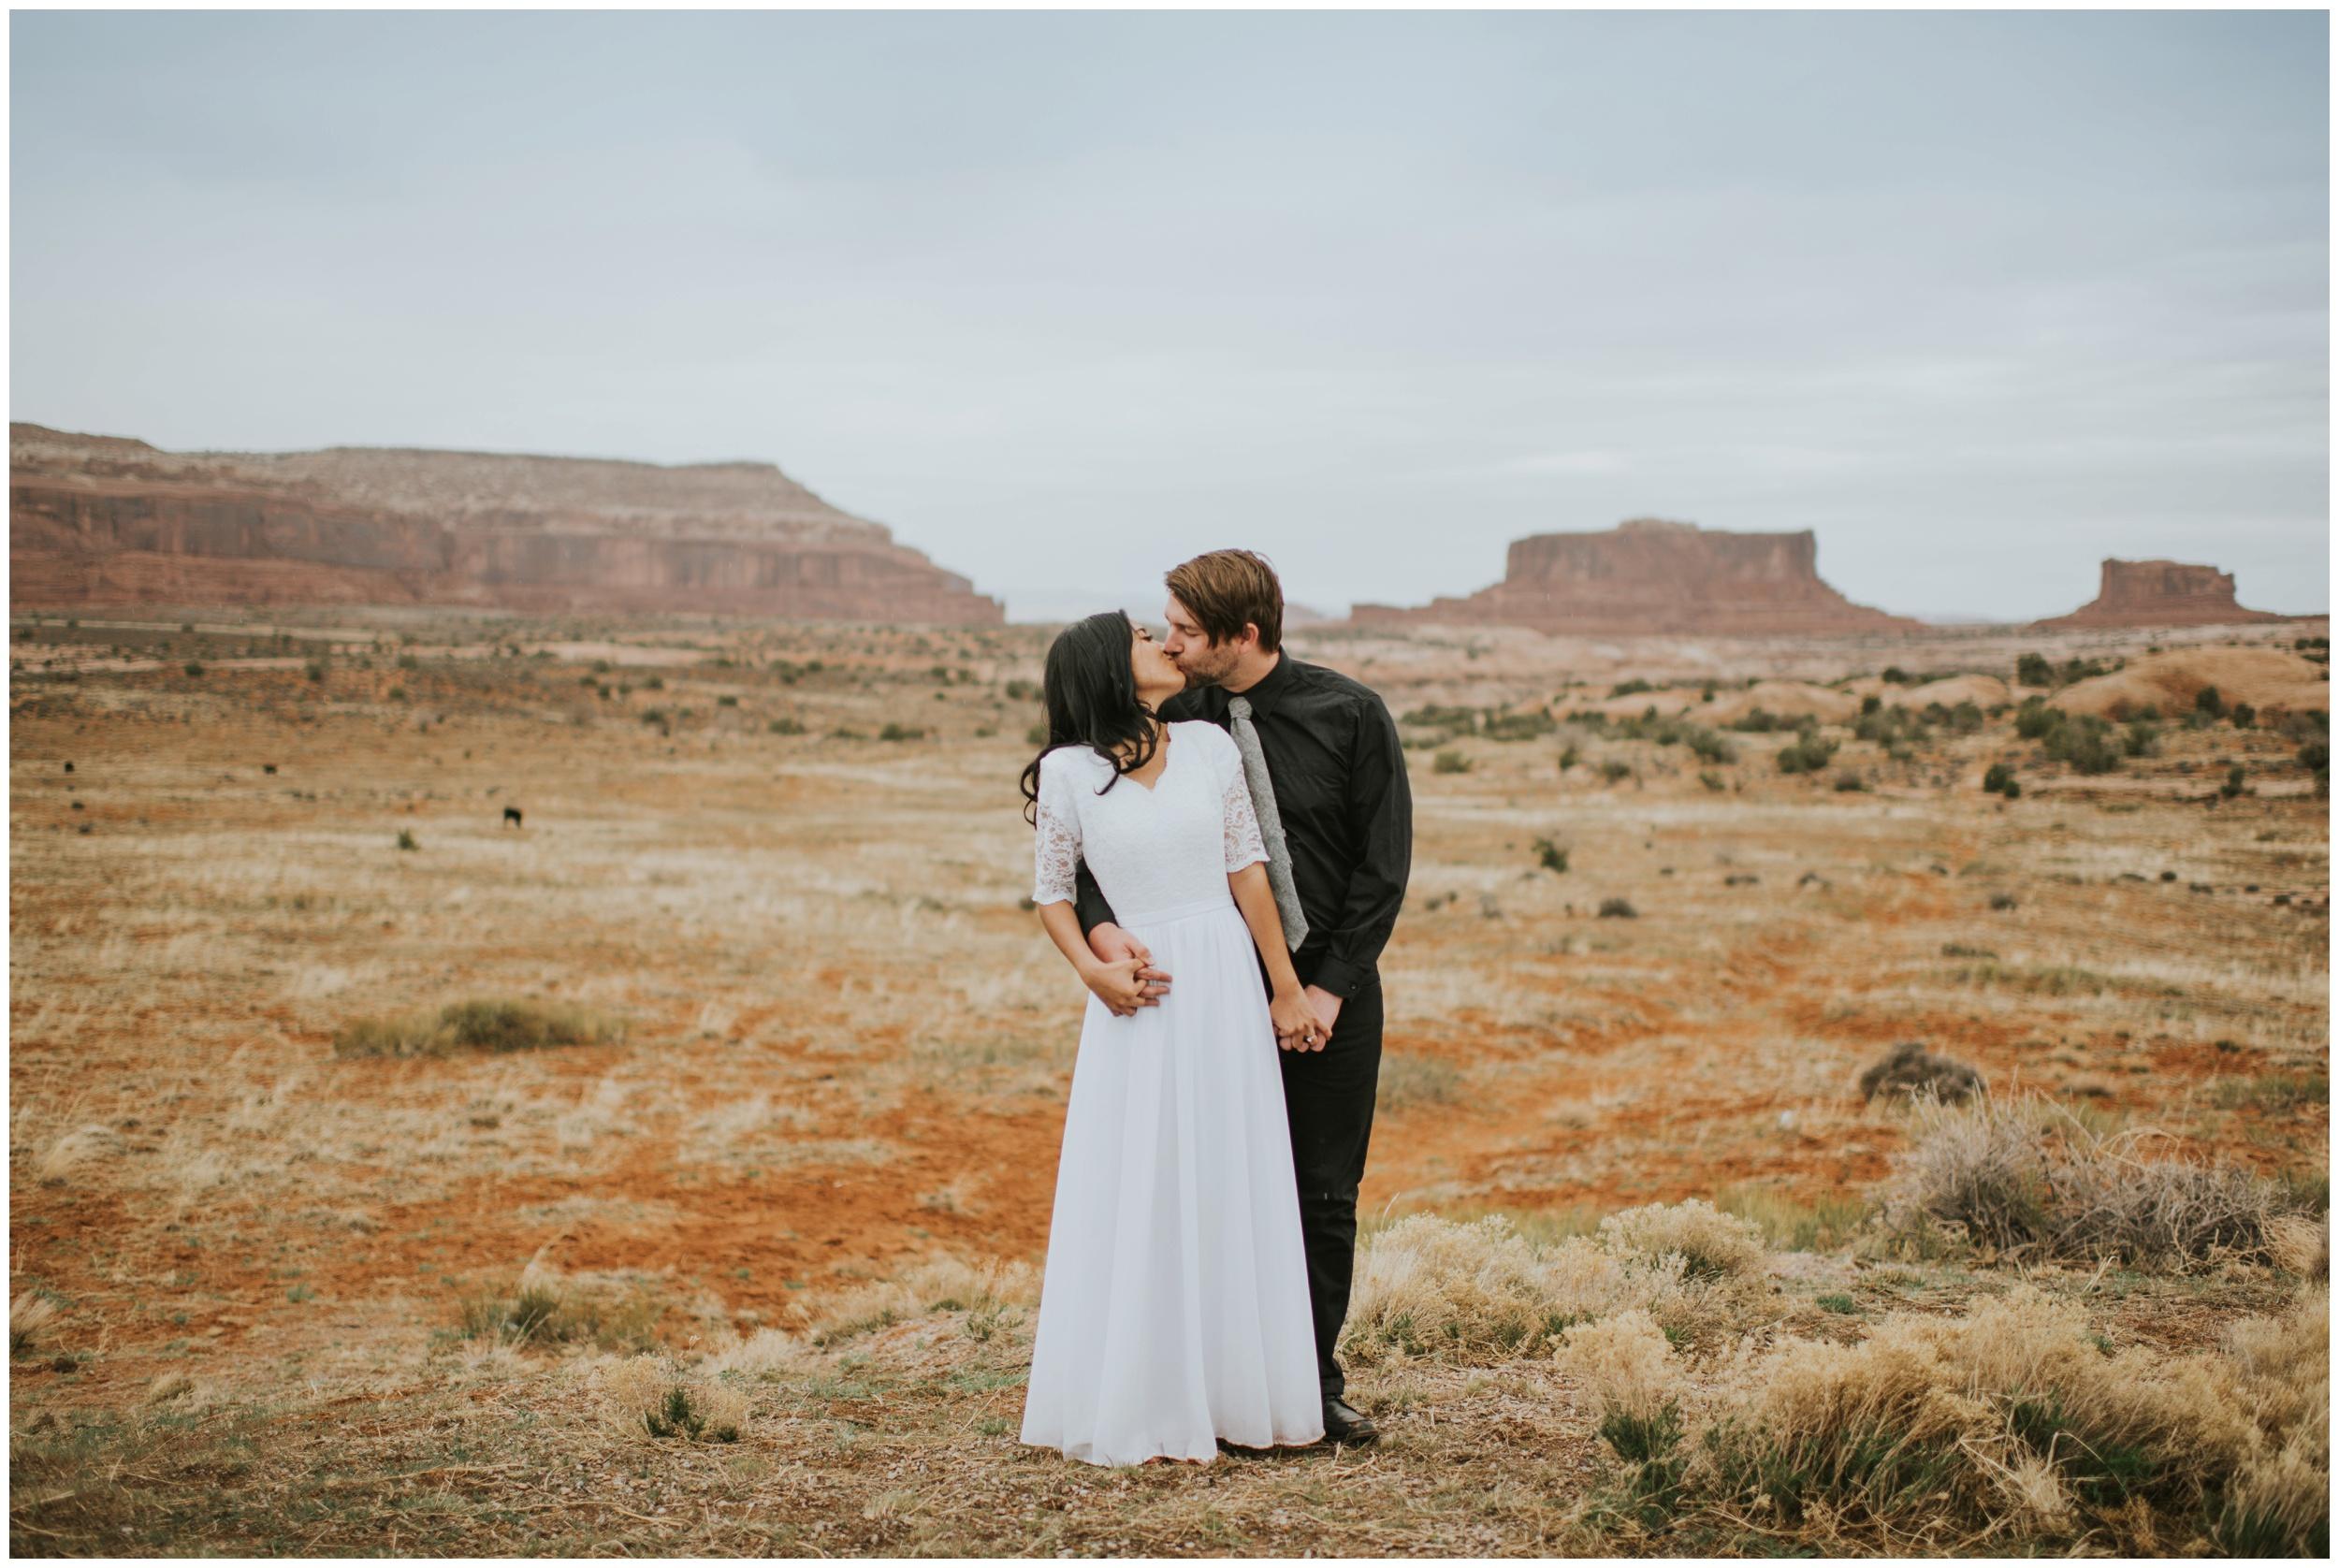 Couple kissing in the desert |Moab Utah, Photographer www.riversandroadsphotography.com